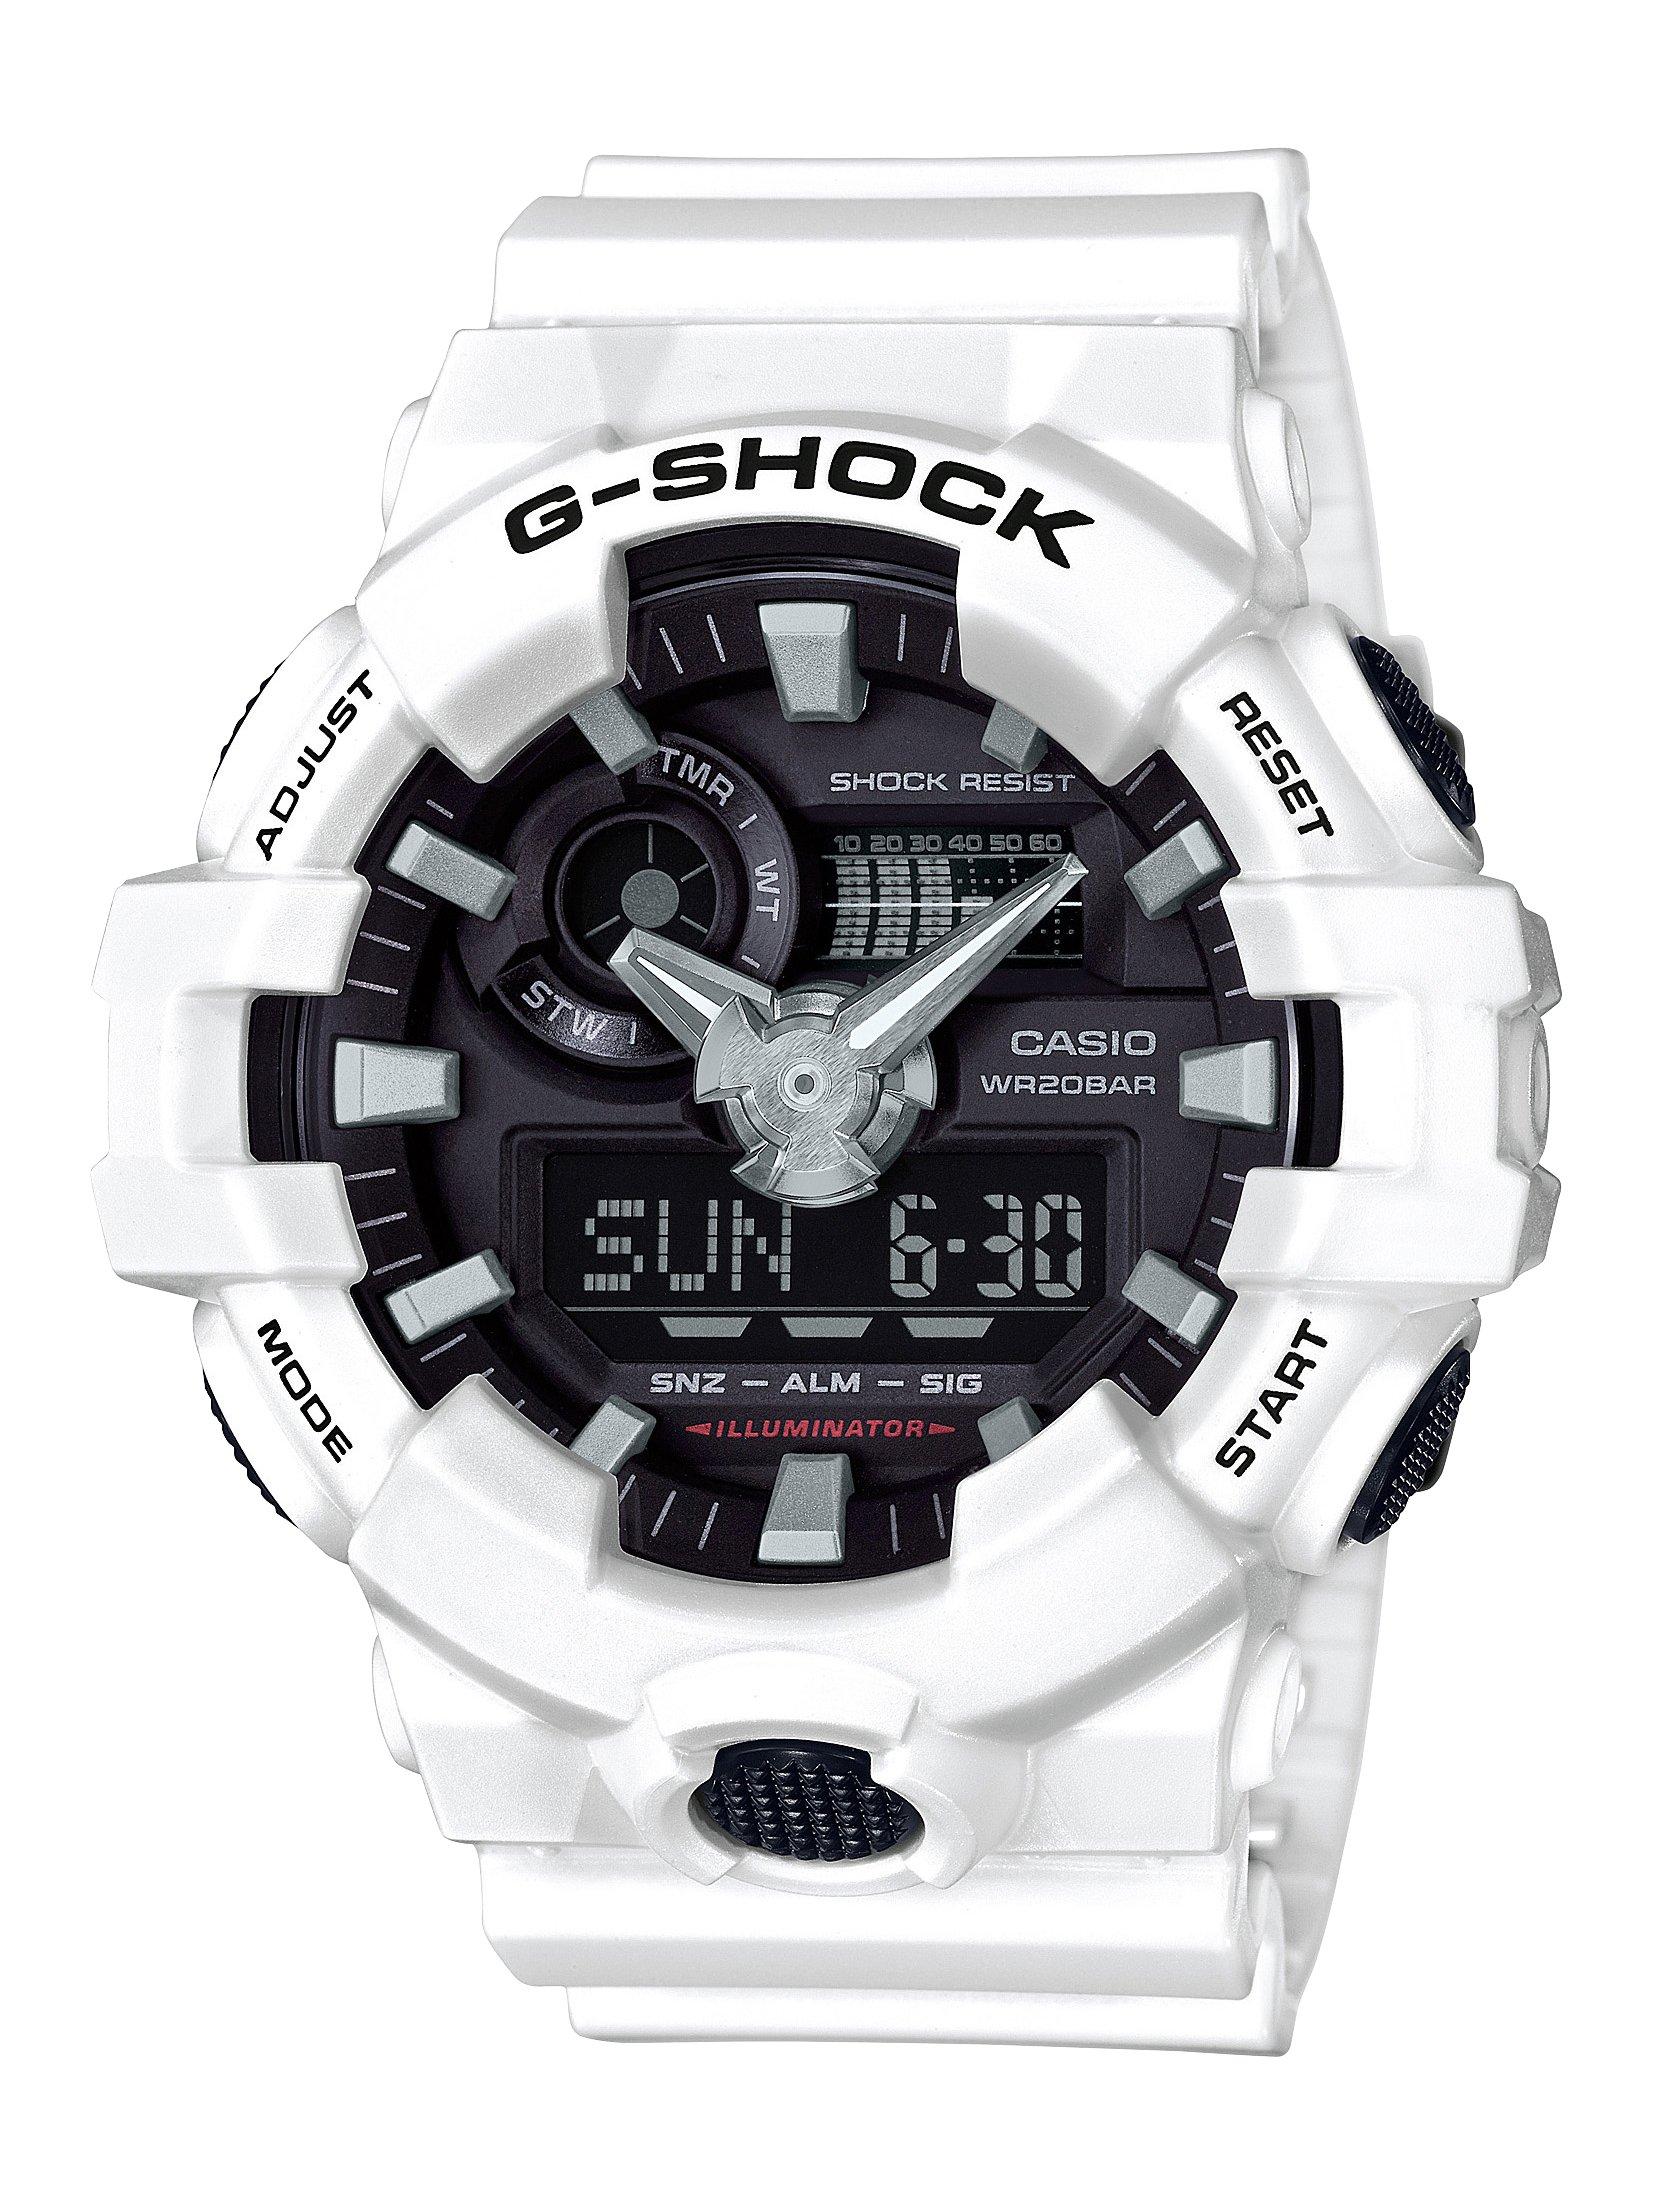 Casio Men's 'G SHOCK' Quartz Resin Casual Watch, Color White (Model: GA-700-7ACR)